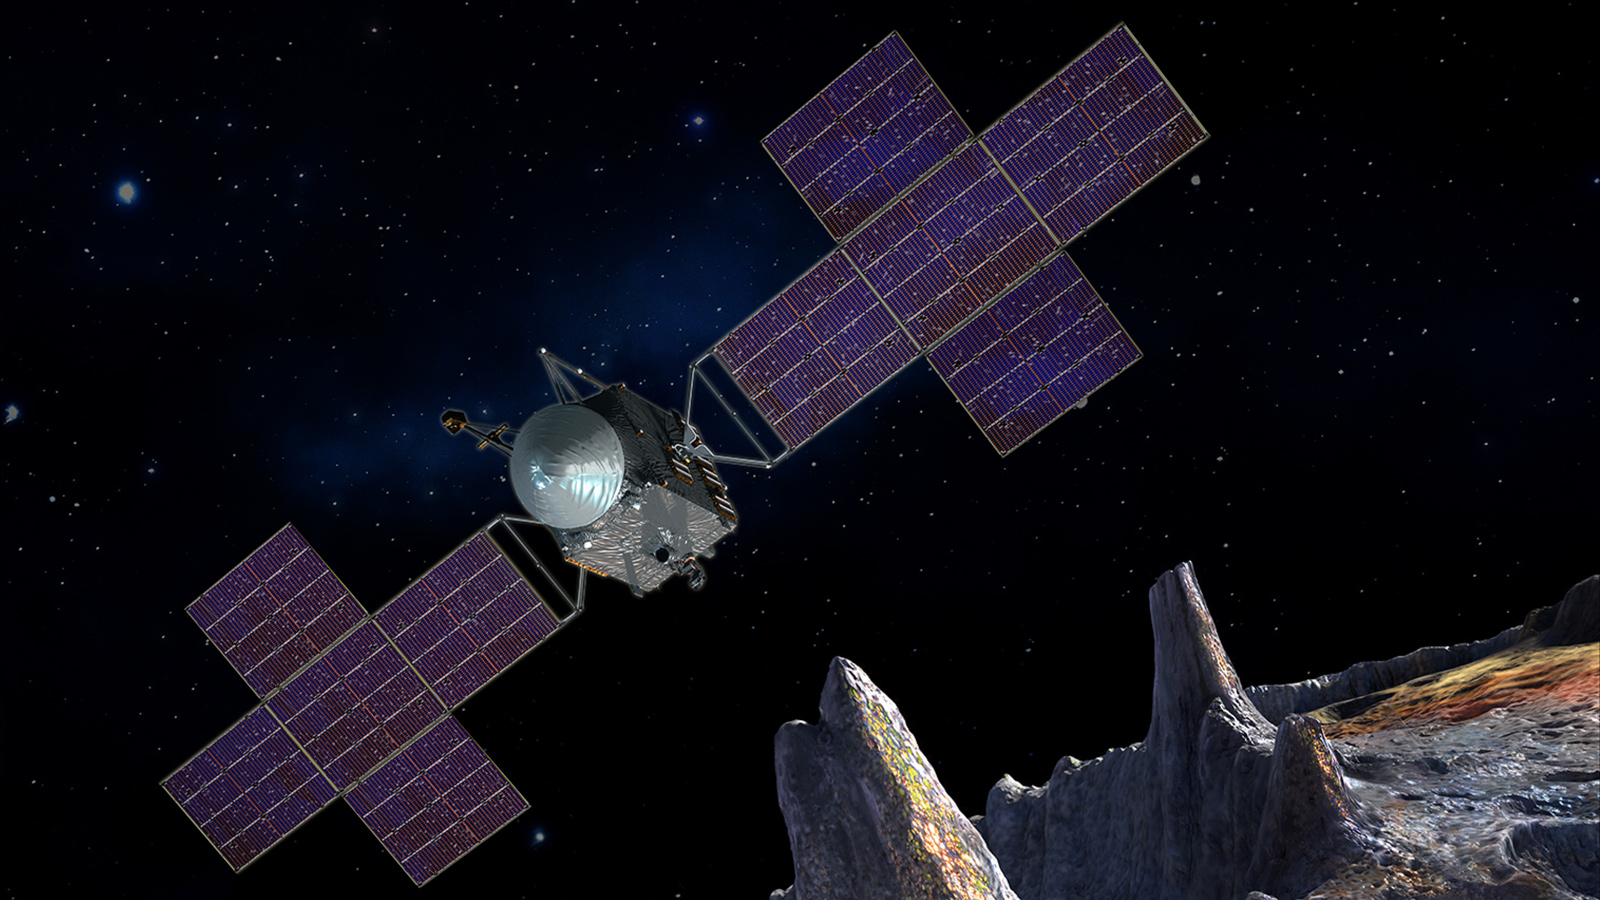 NASA-JPL mock-up of the design for Psyche orbiter. Image credit: NASA/JPL